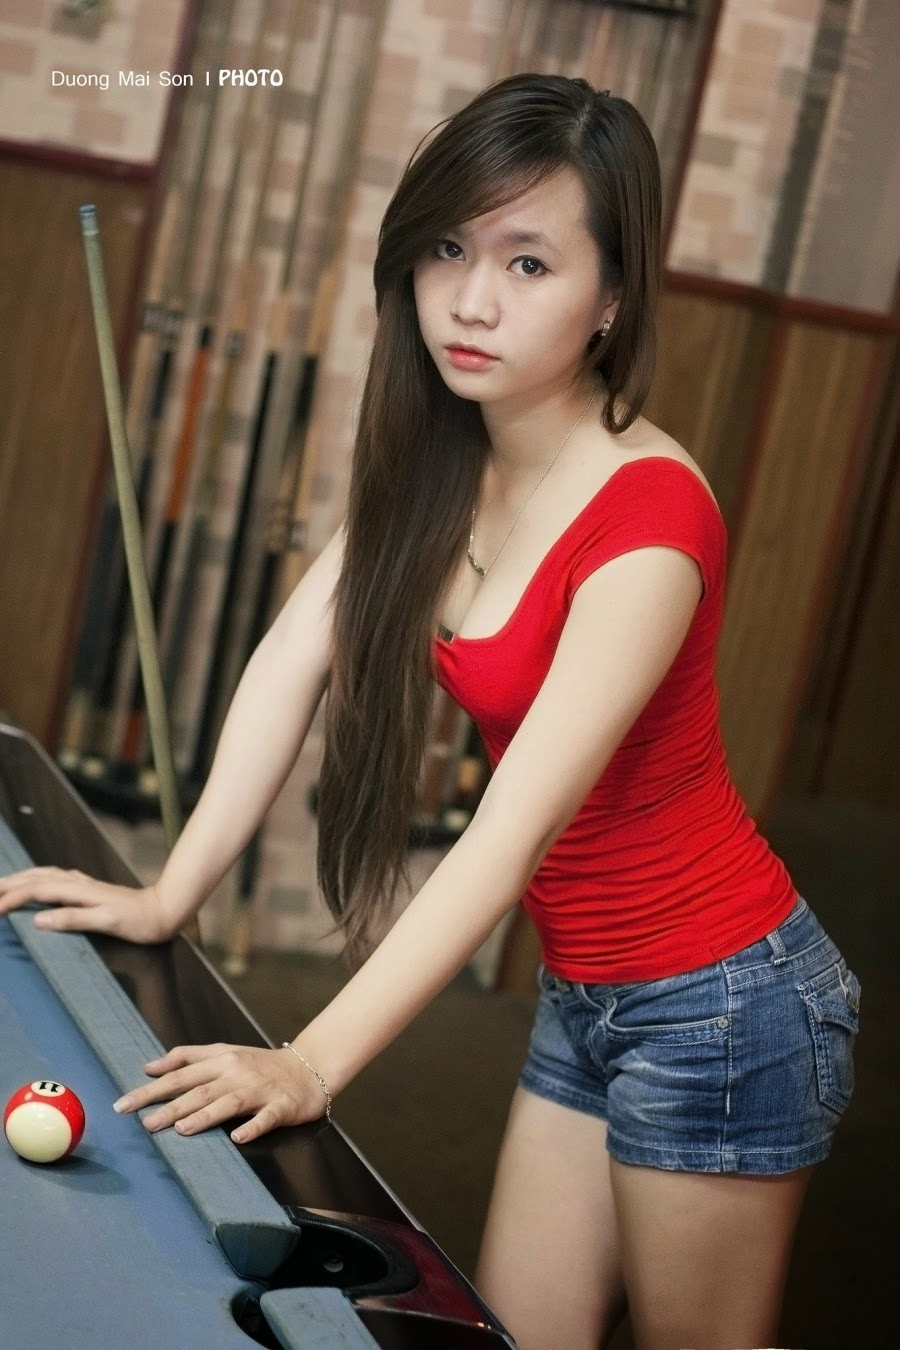 Vietnamese hot teen babe porn, nude stepdad pics gallery